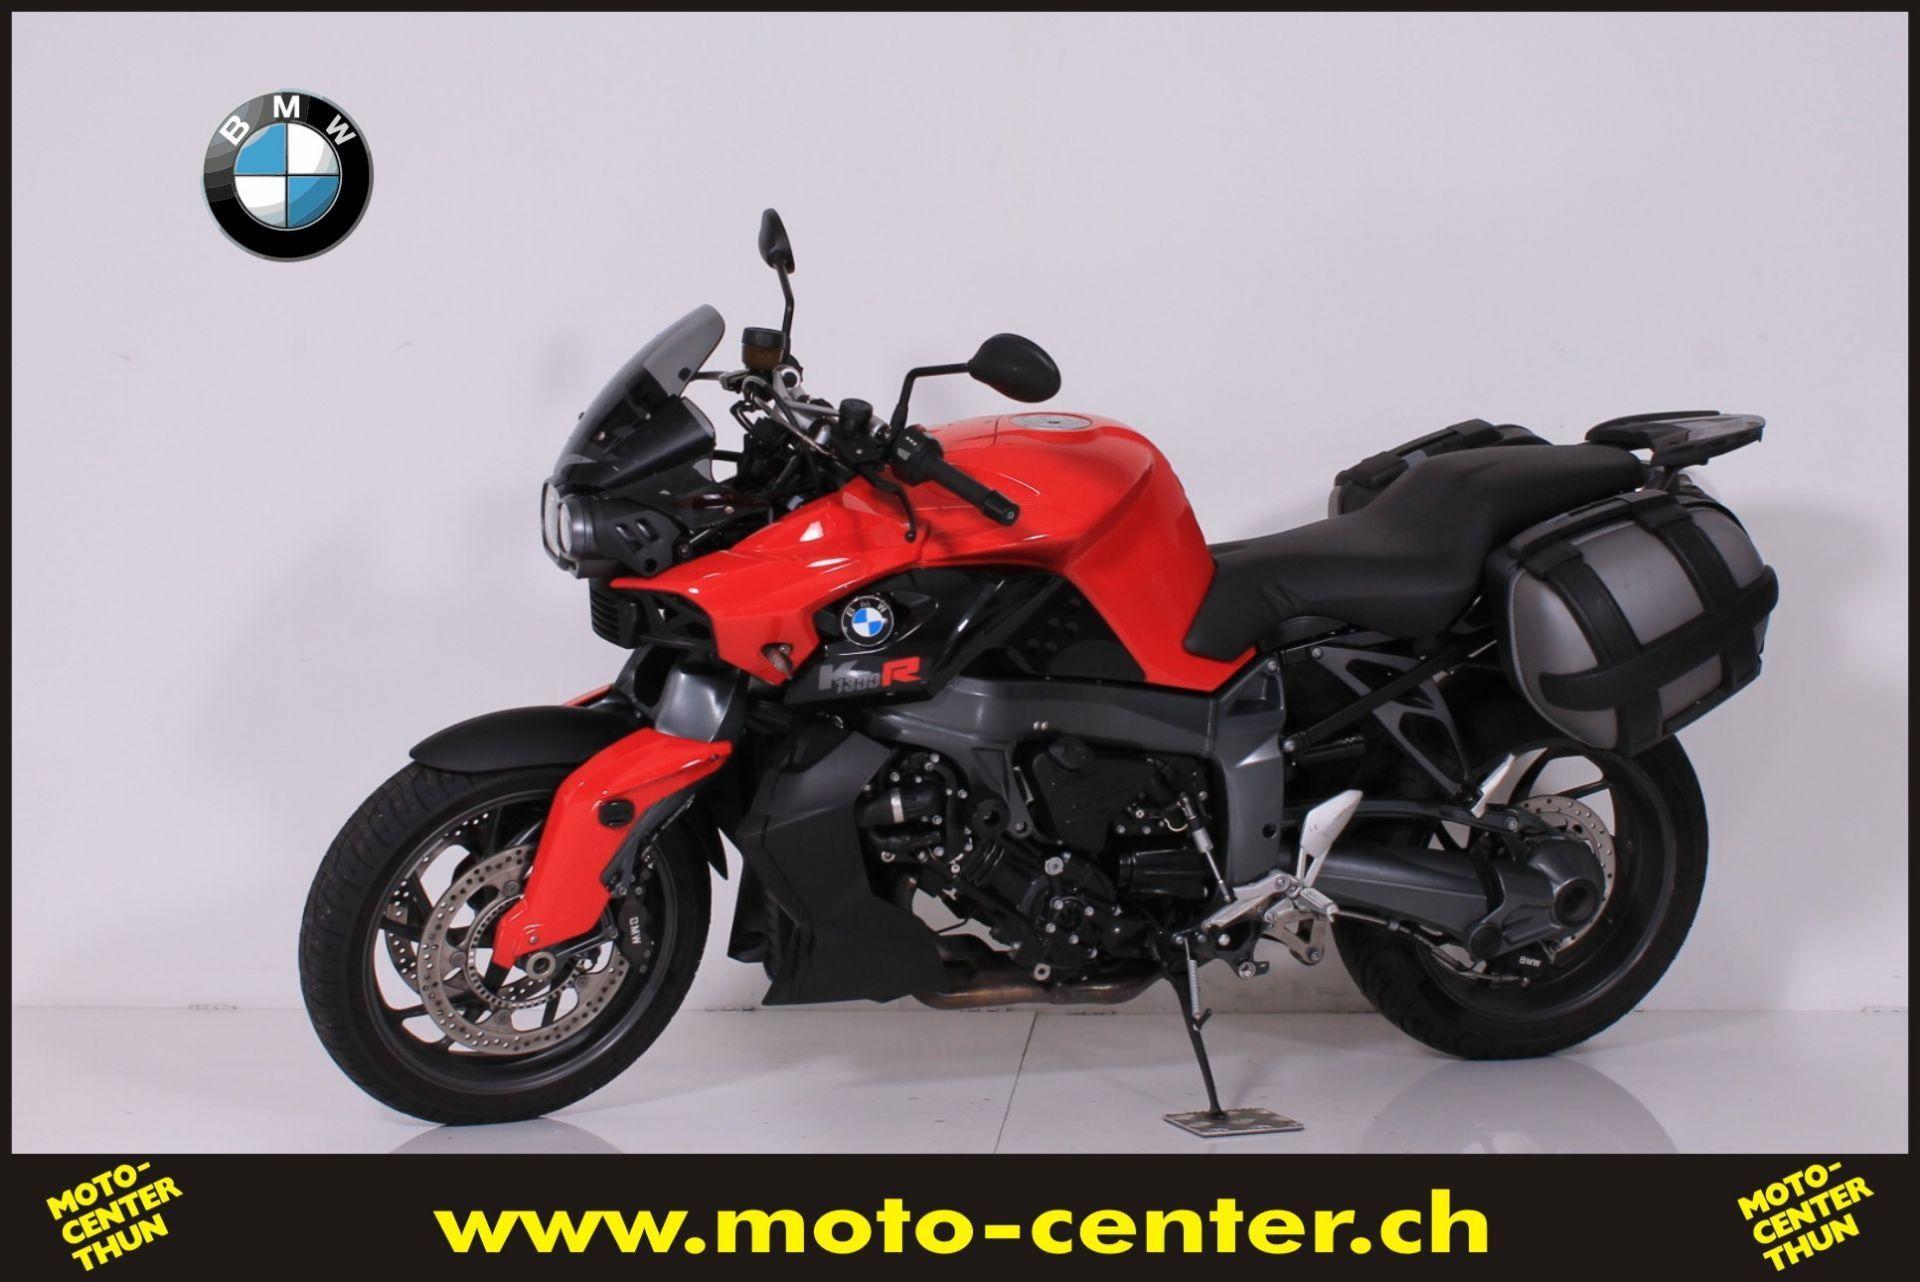 moto occasions acheter bmw k 1300 r ab chf pro monat moto center thun steffisburg. Black Bedroom Furniture Sets. Home Design Ideas